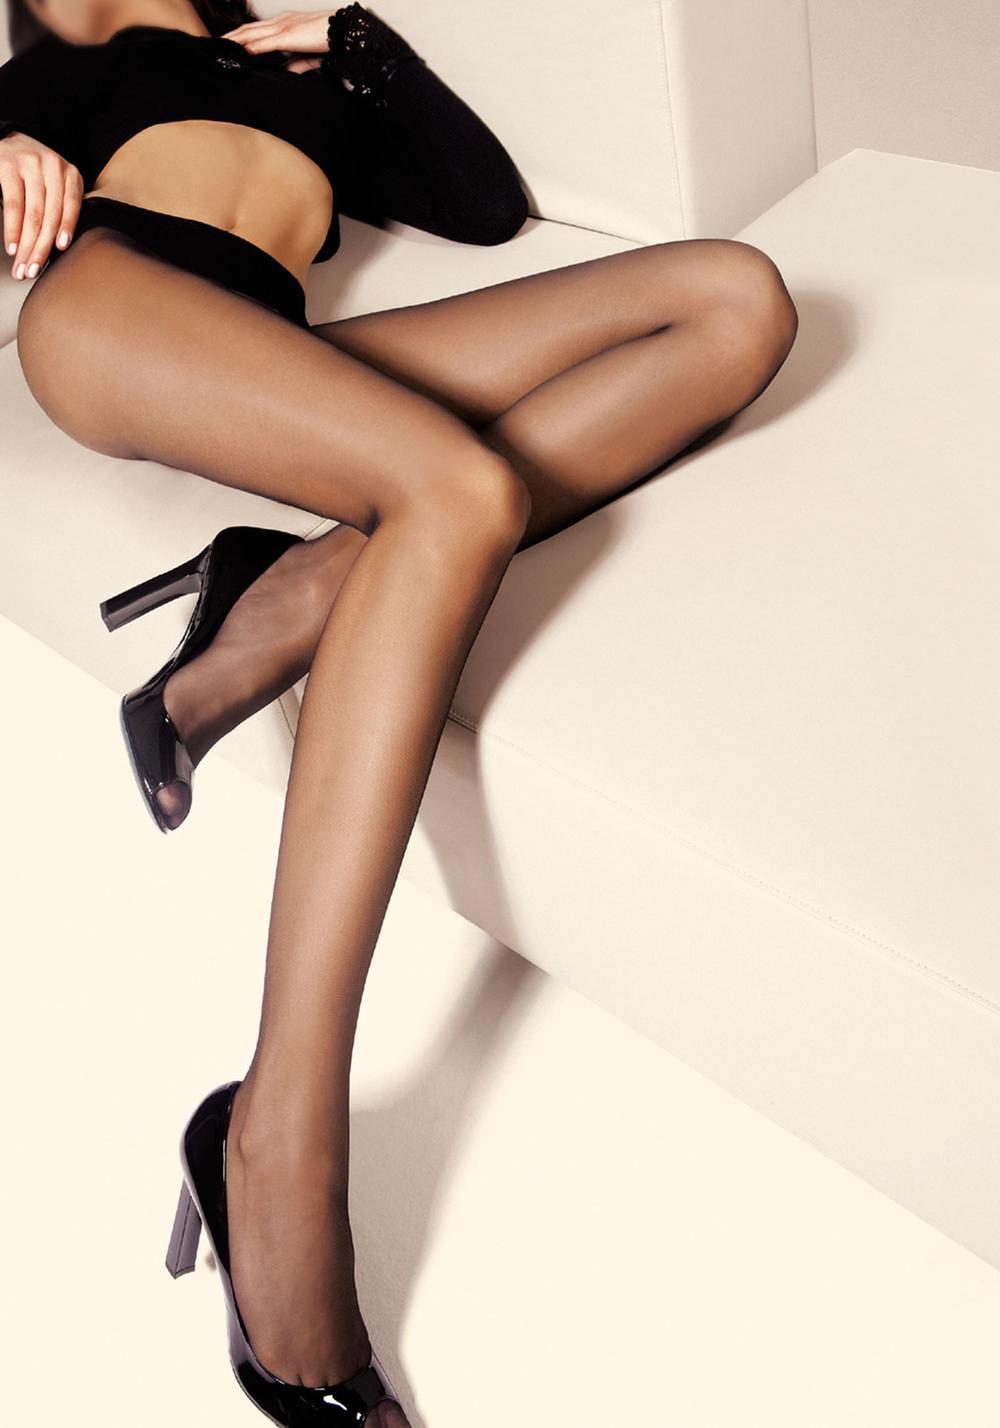 https://golden-legs.com.ua/images/stories/virtuemart/product/BE_FREE.jpg